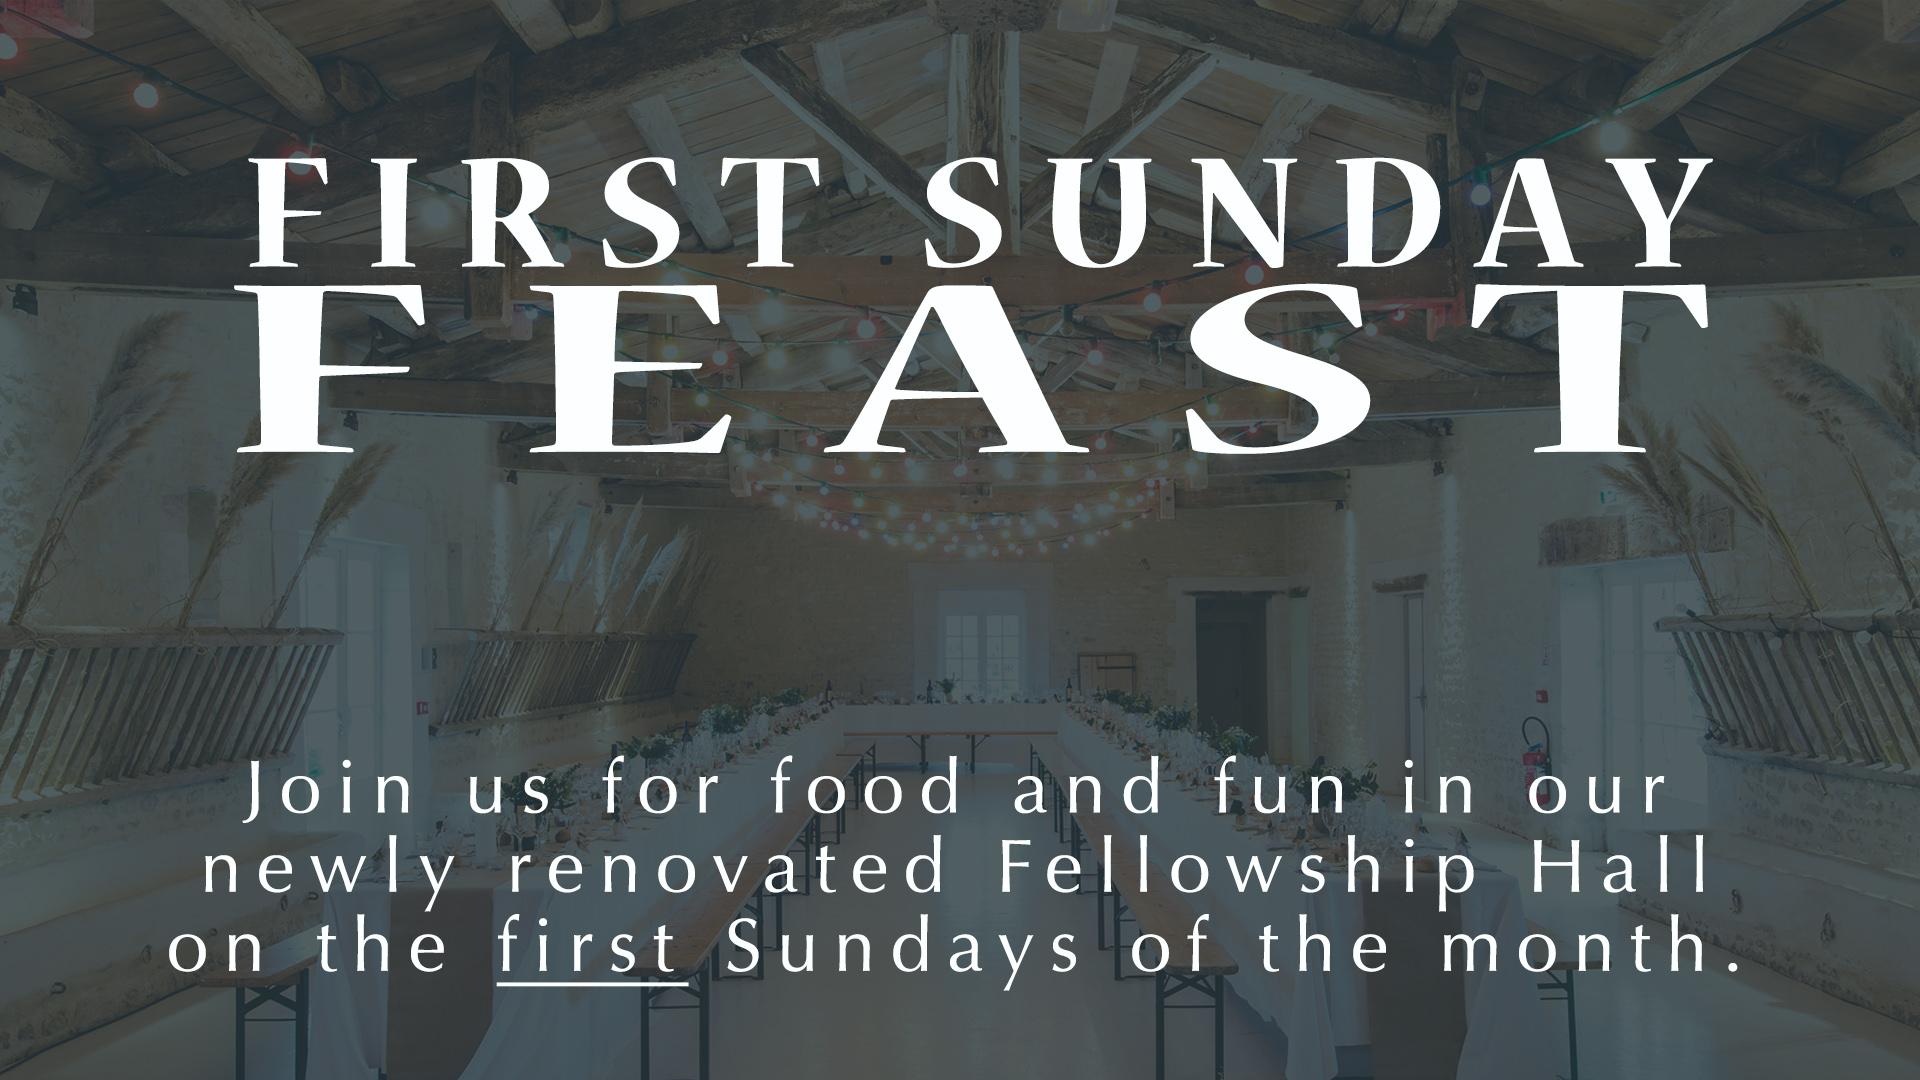 First Sunday Feast